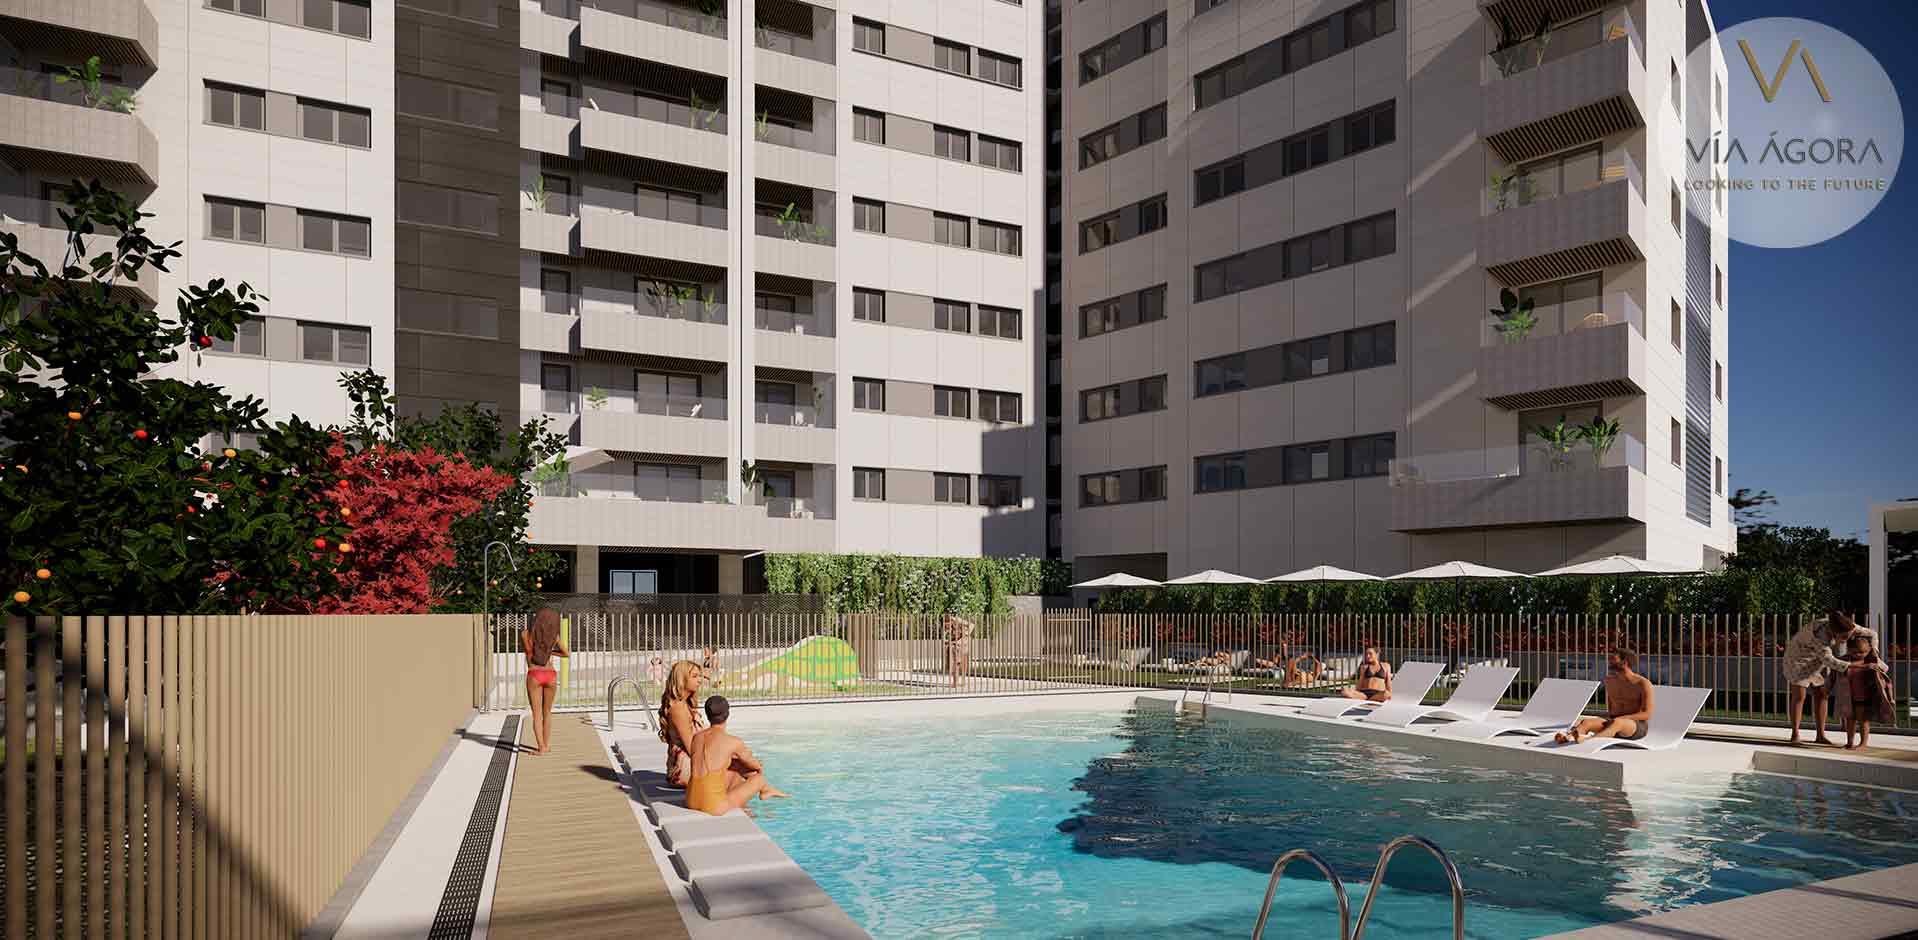 piscina-vivienda-via-agora